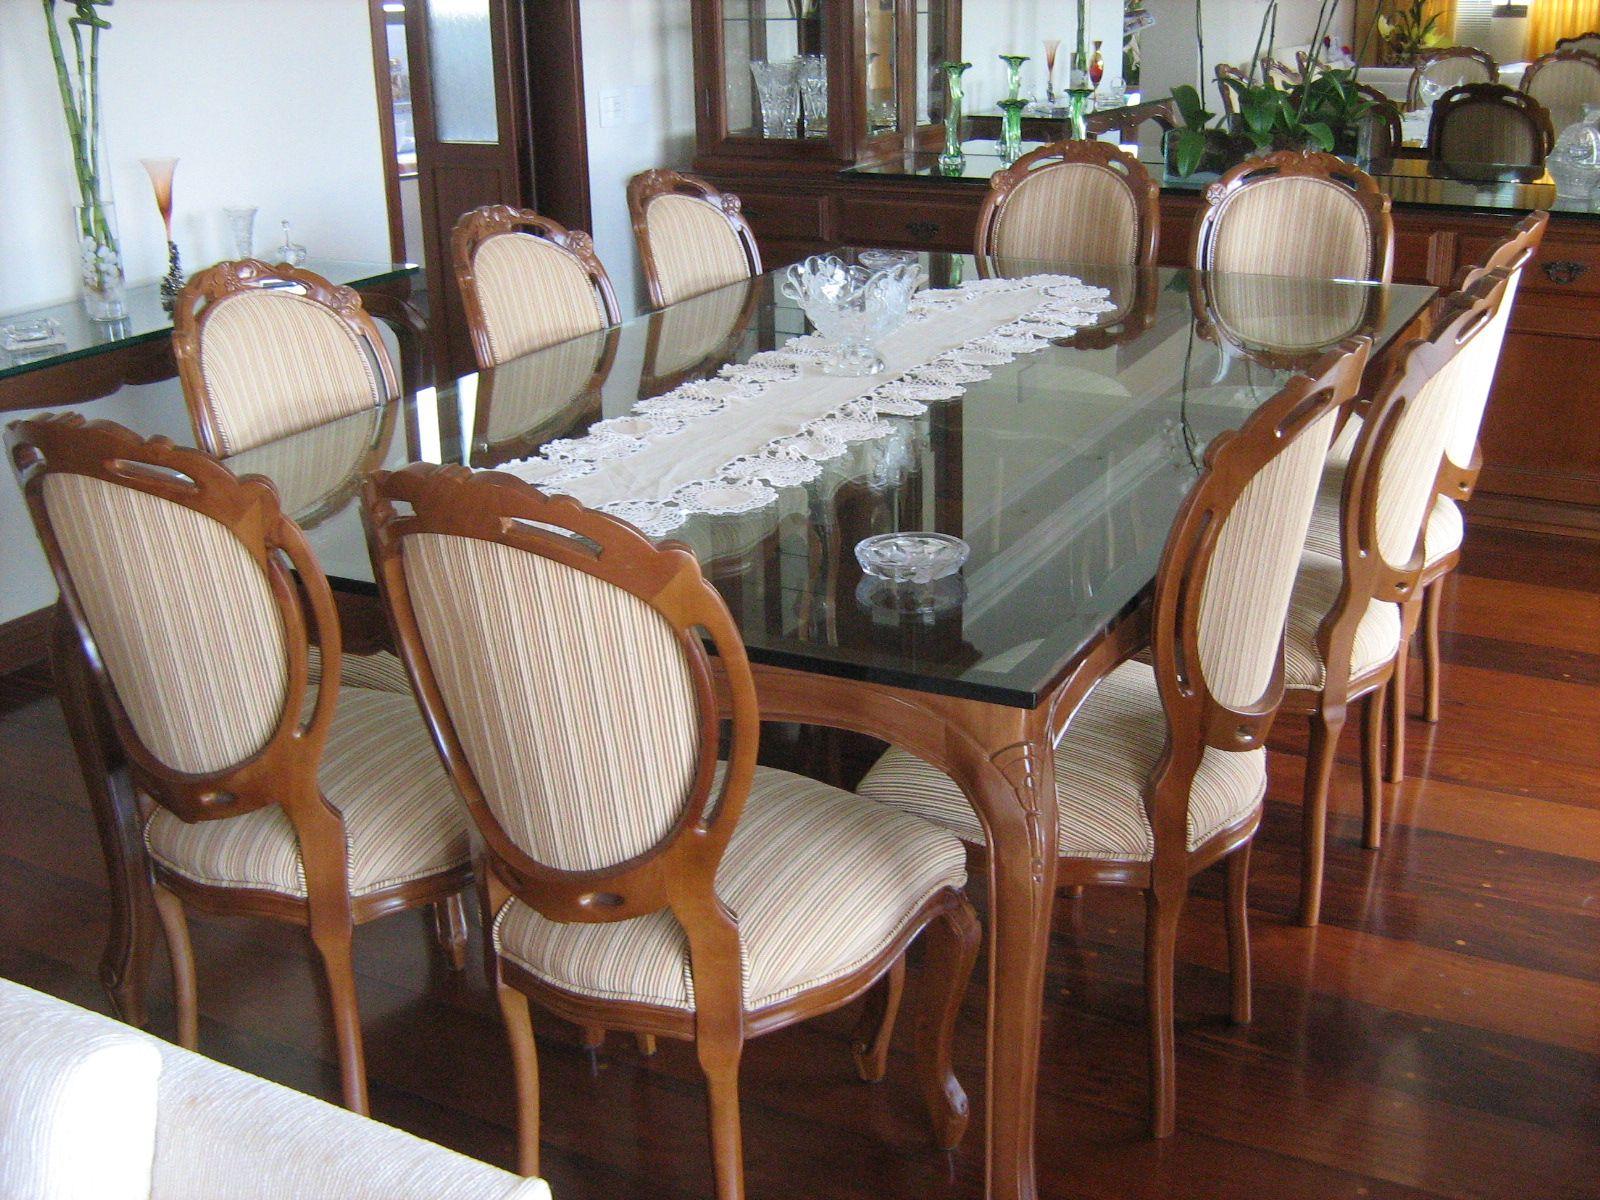 Conjunto De Sala De Jantar Luis Xv ~  Salas de Jantar  Pinterest  Cadeira medalhão, Sala de jantar de